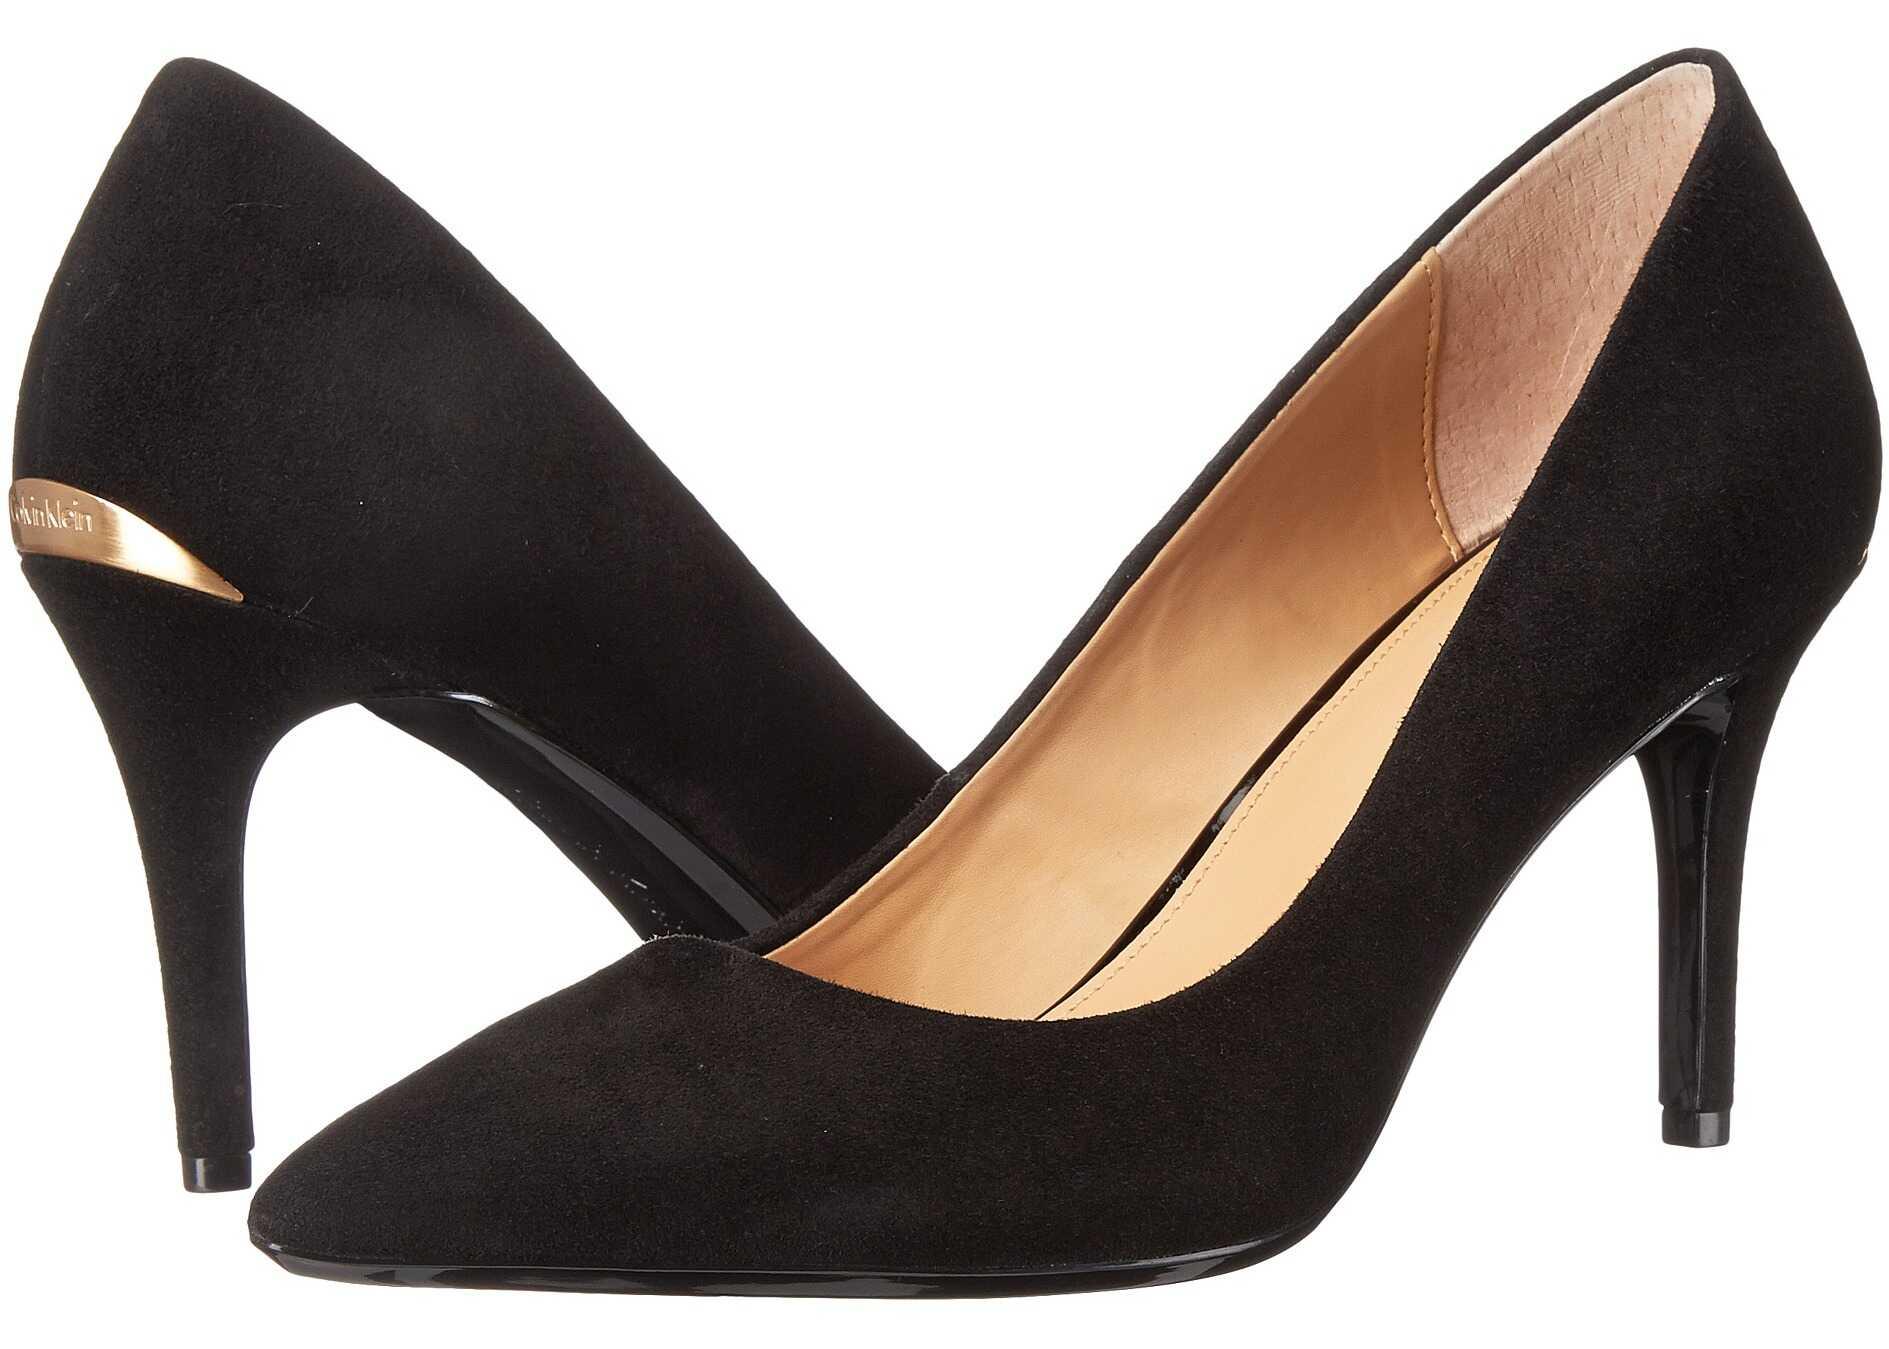 Calvin Klein Gayle Pump Black Leather/Suede